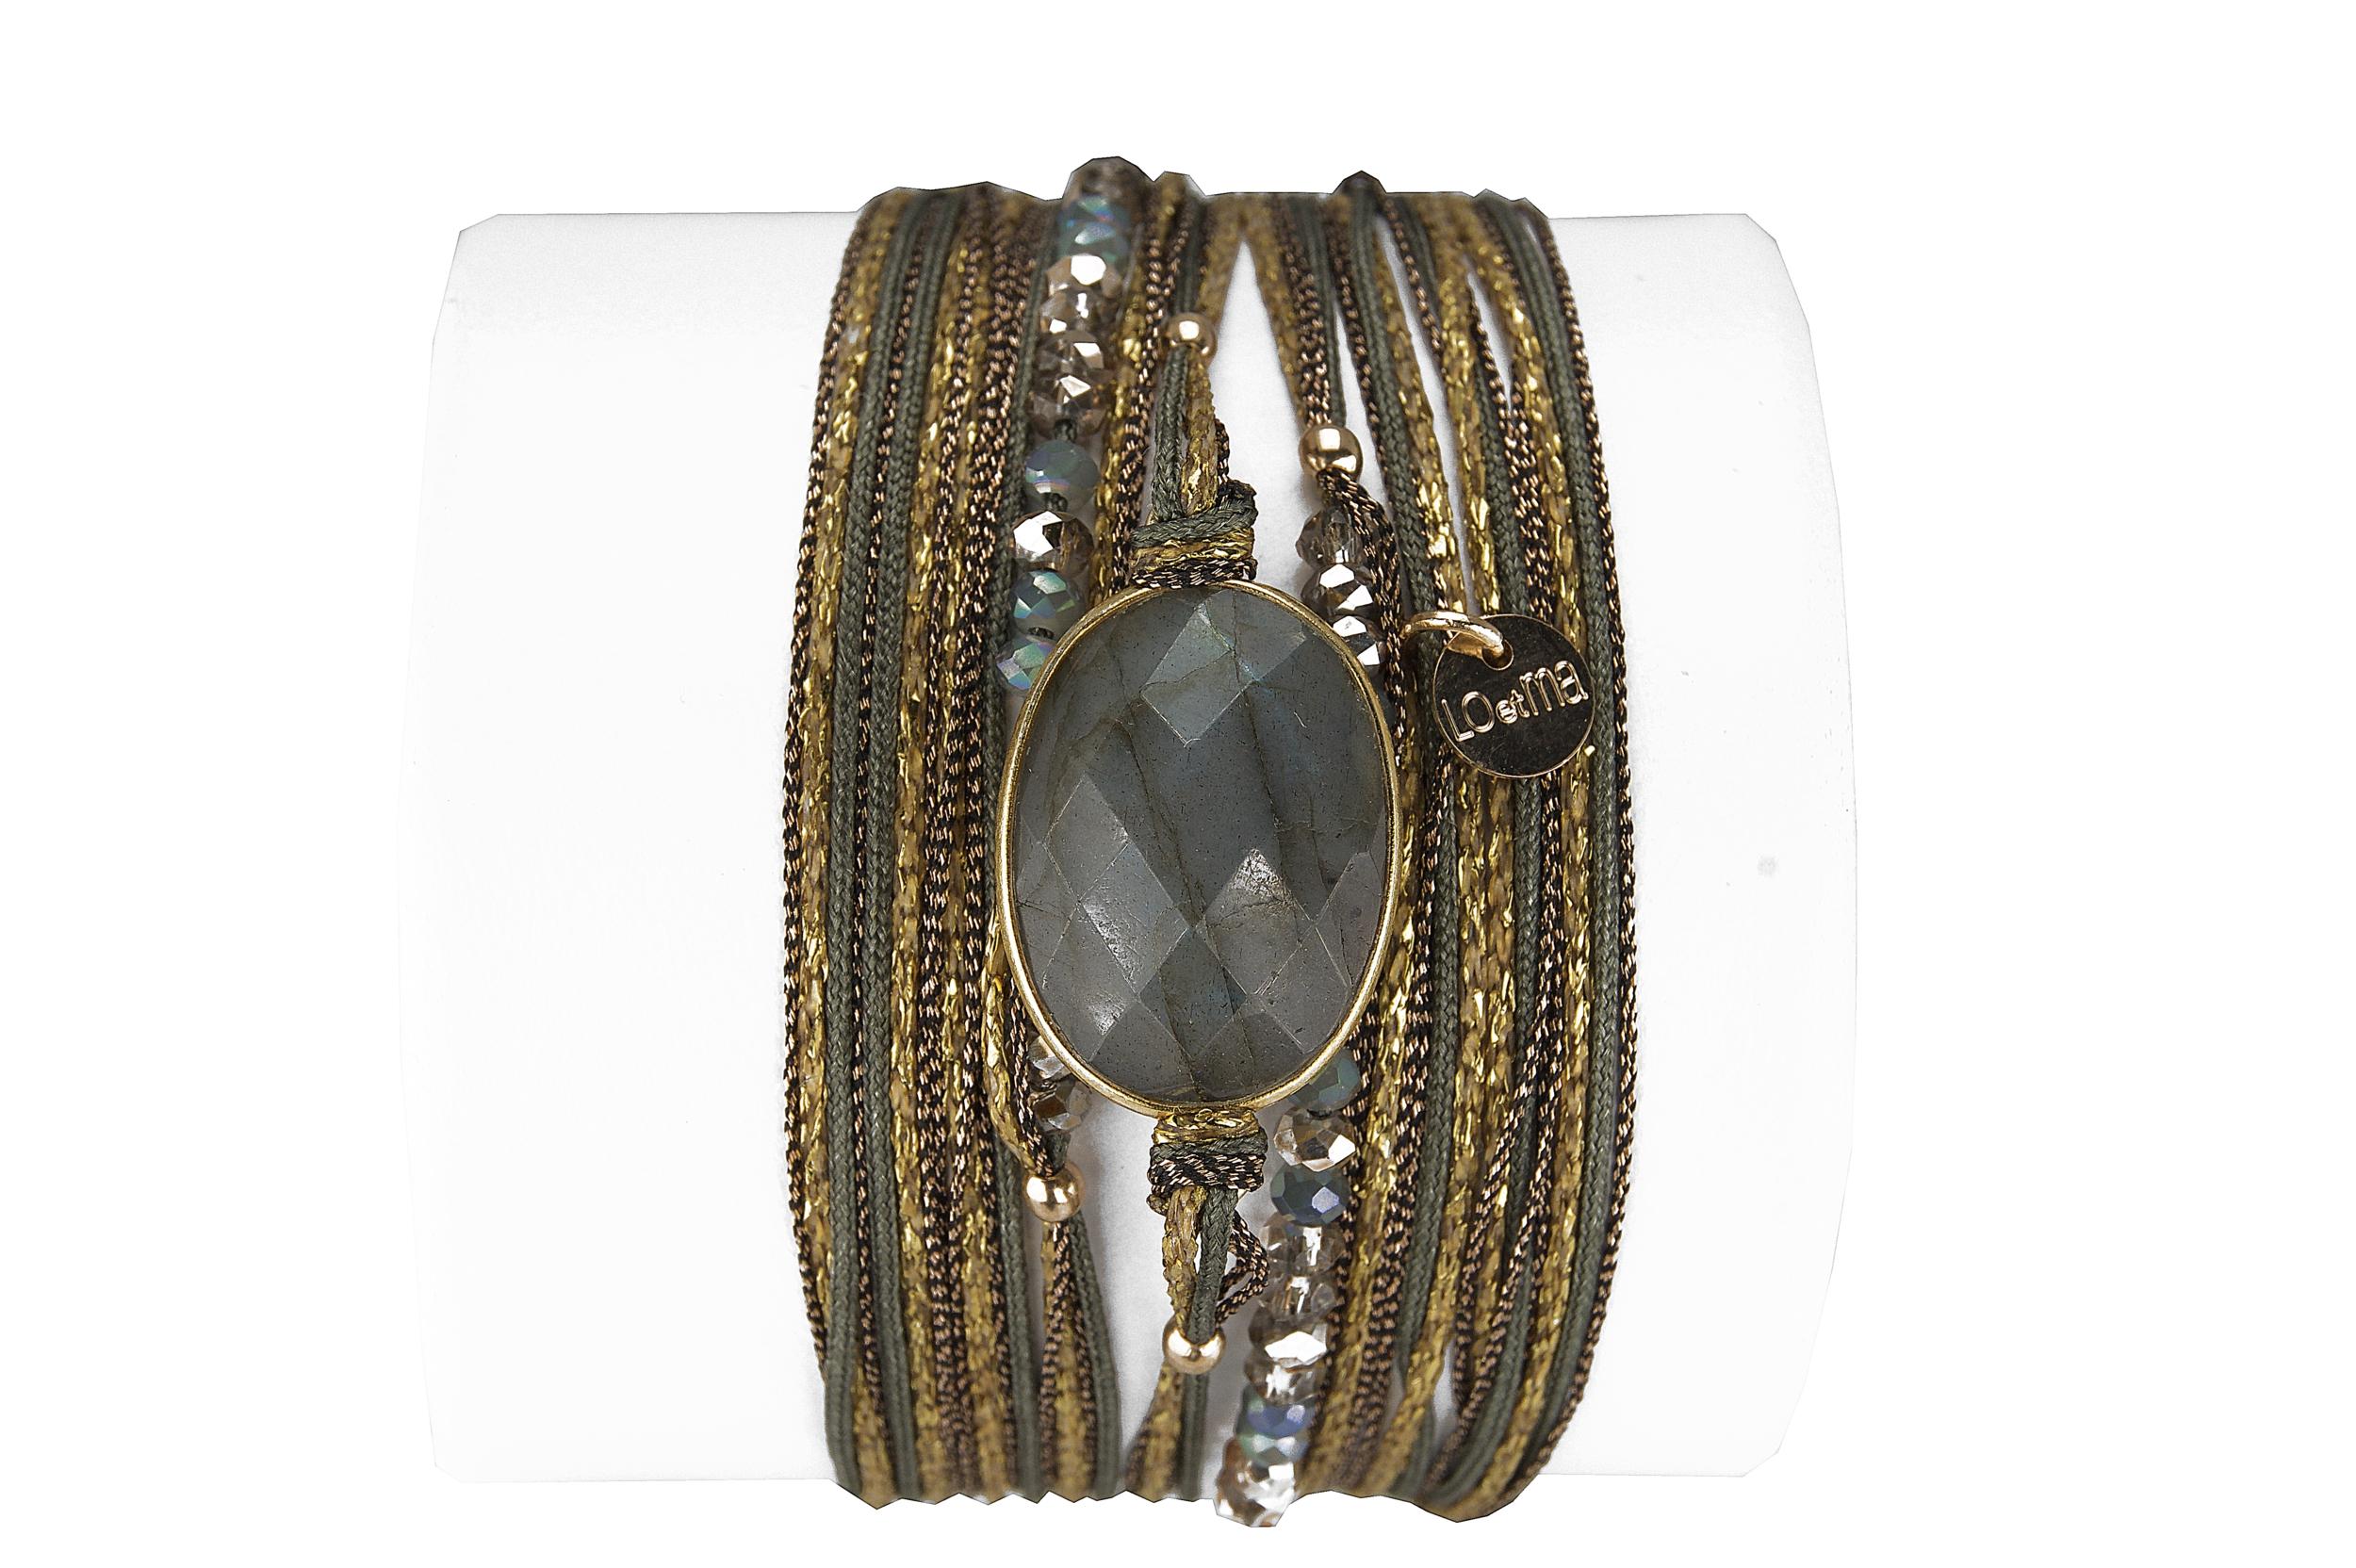 Eté Labradorite Labradorite Eté Diva Bracelet Labradorite Bracelet Bracelet Eté Diva Diva xodBCerW